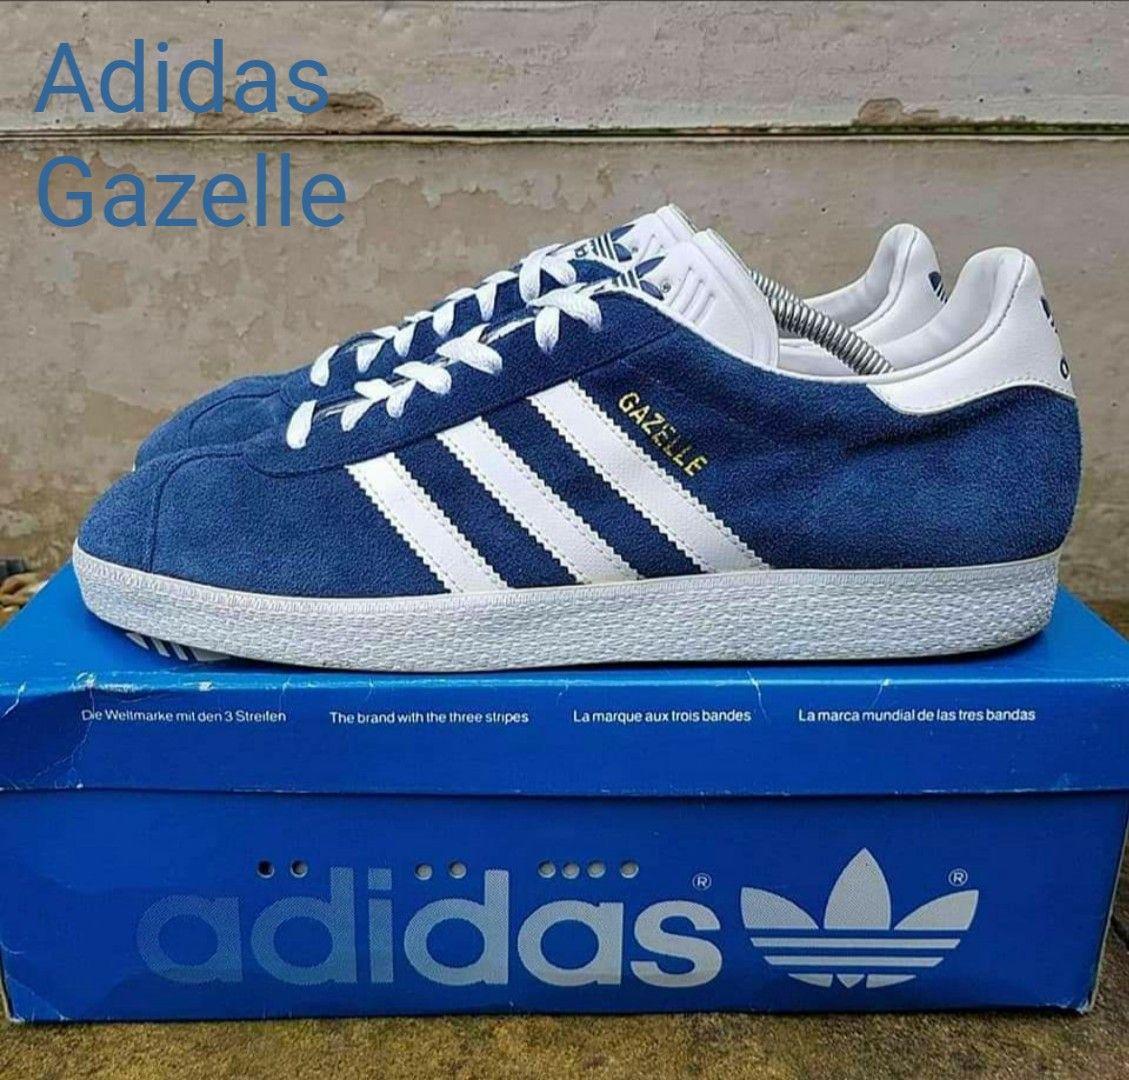 regard détaillé 76fbb 4e5f2 Marine blue Adidas Gazelle from 1995 | Adidas Originals ...